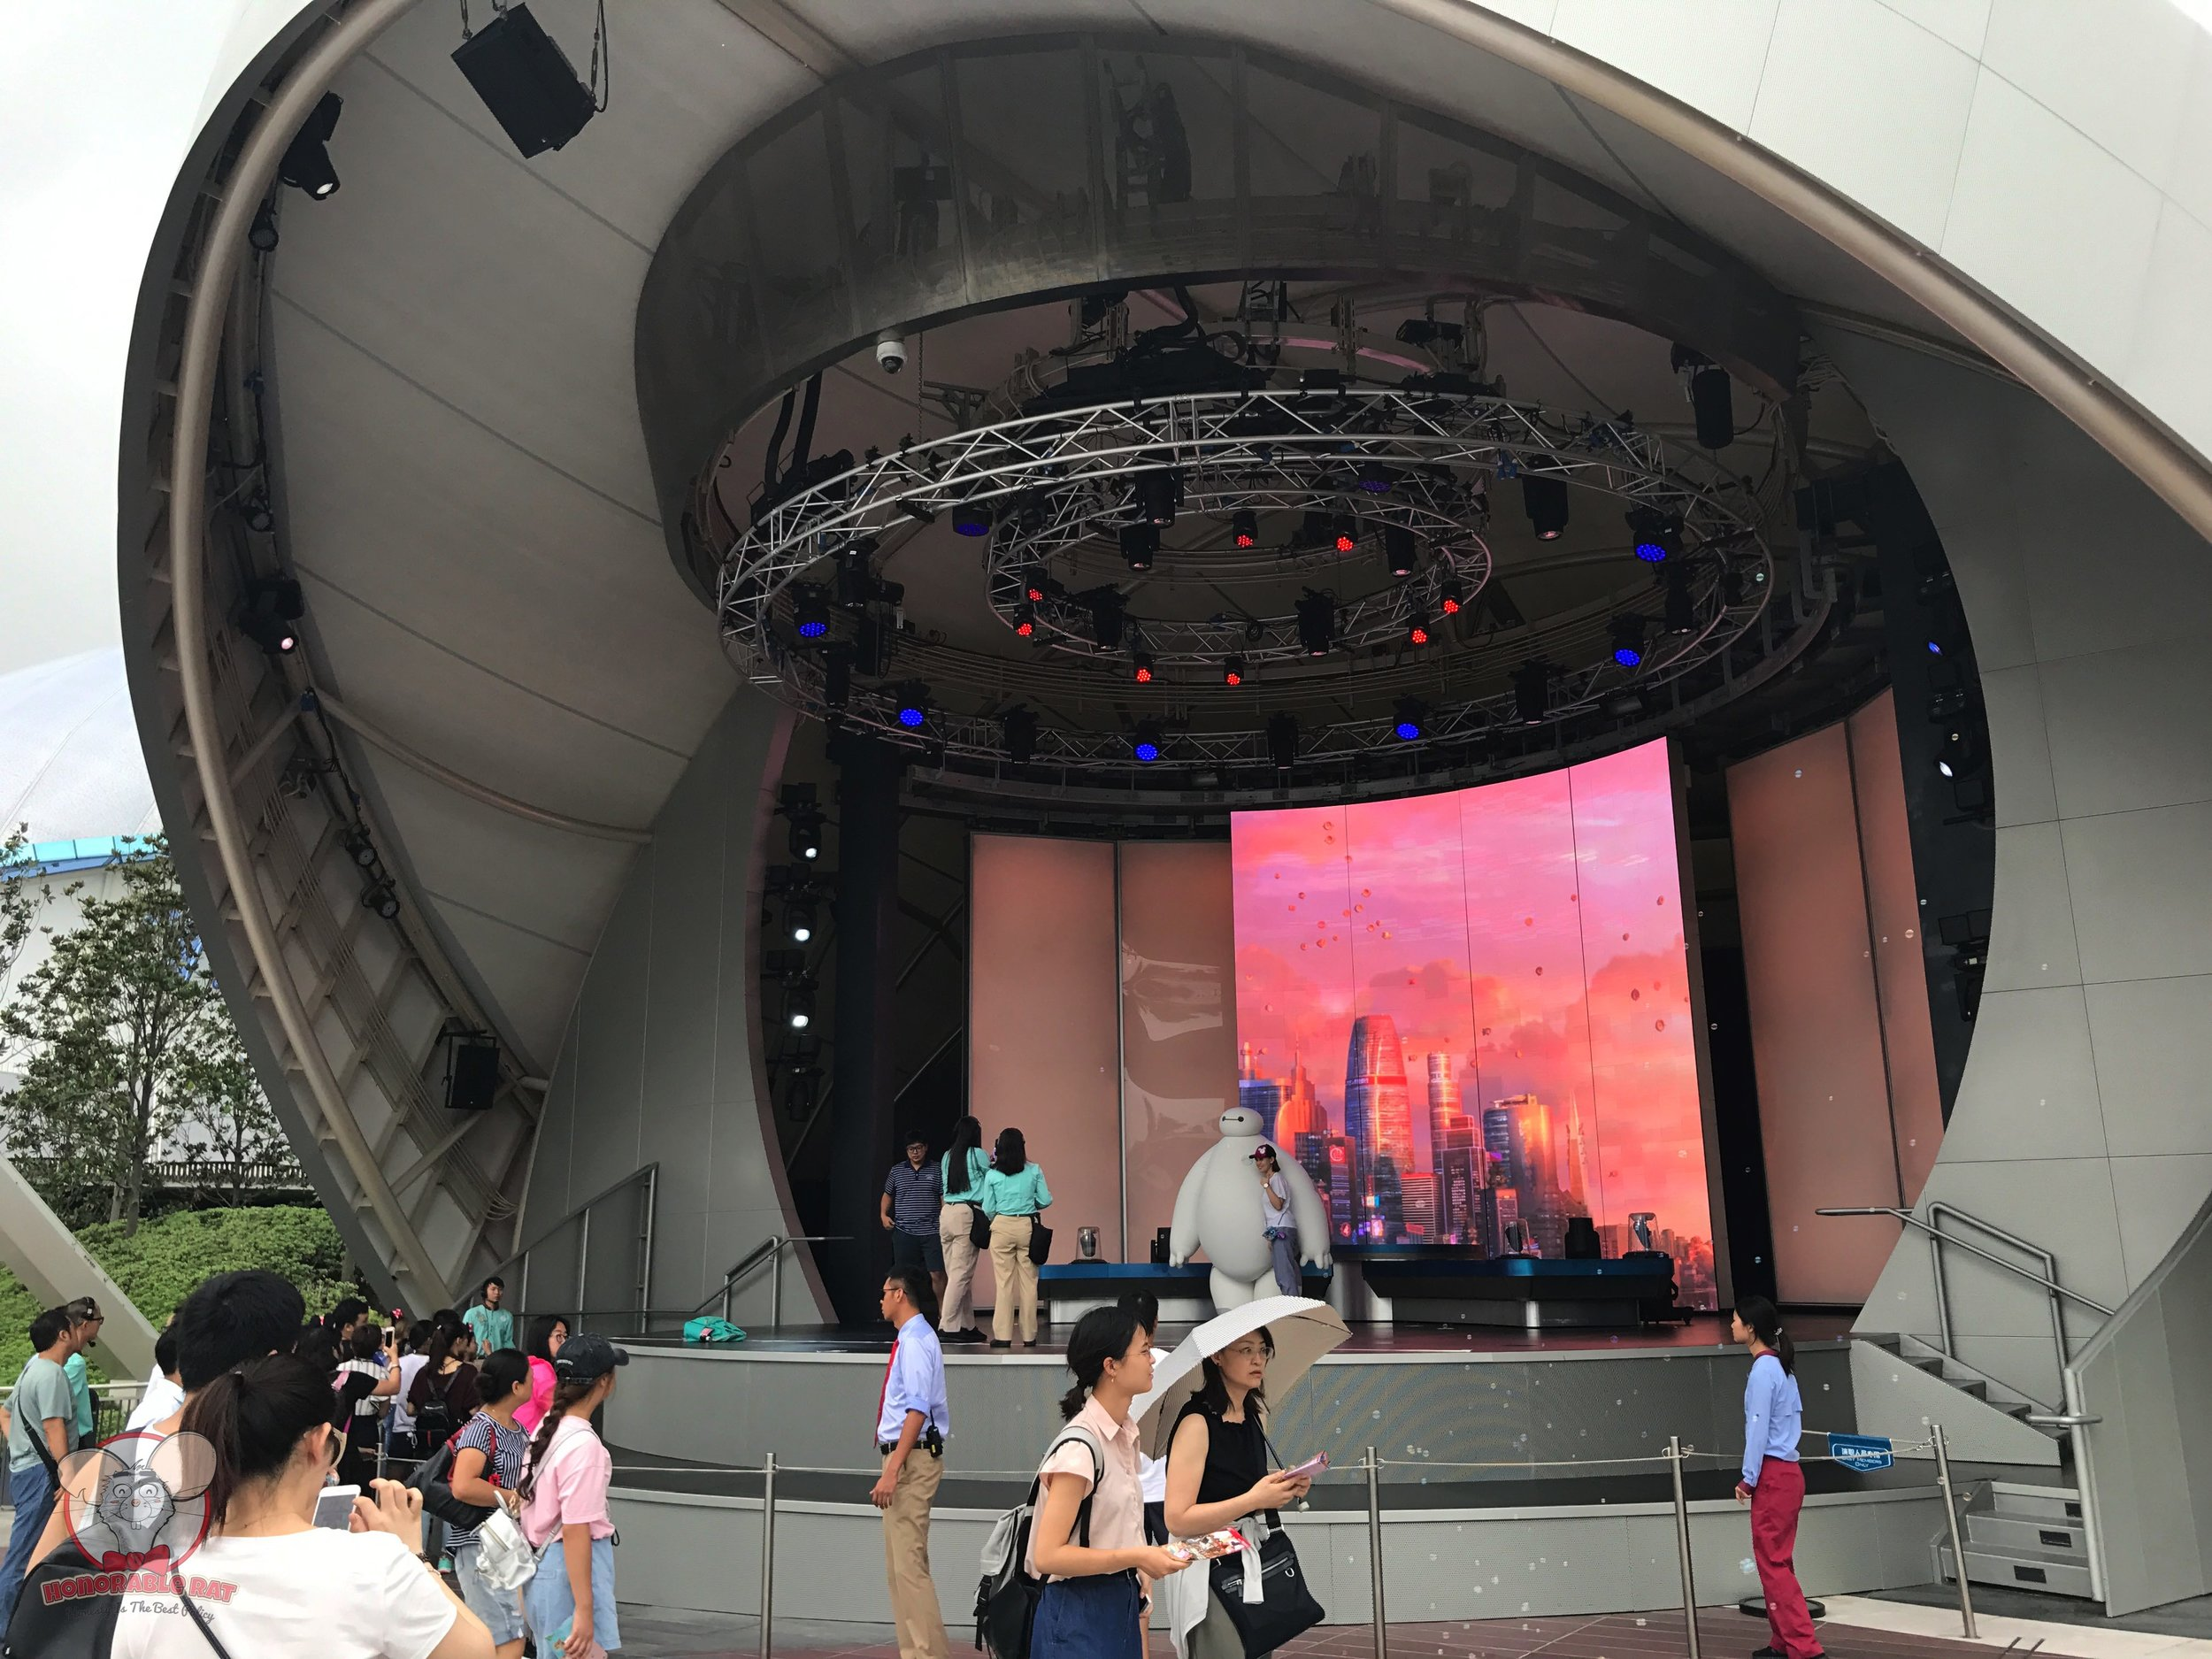 Meeting Baymax in Tomorrowland